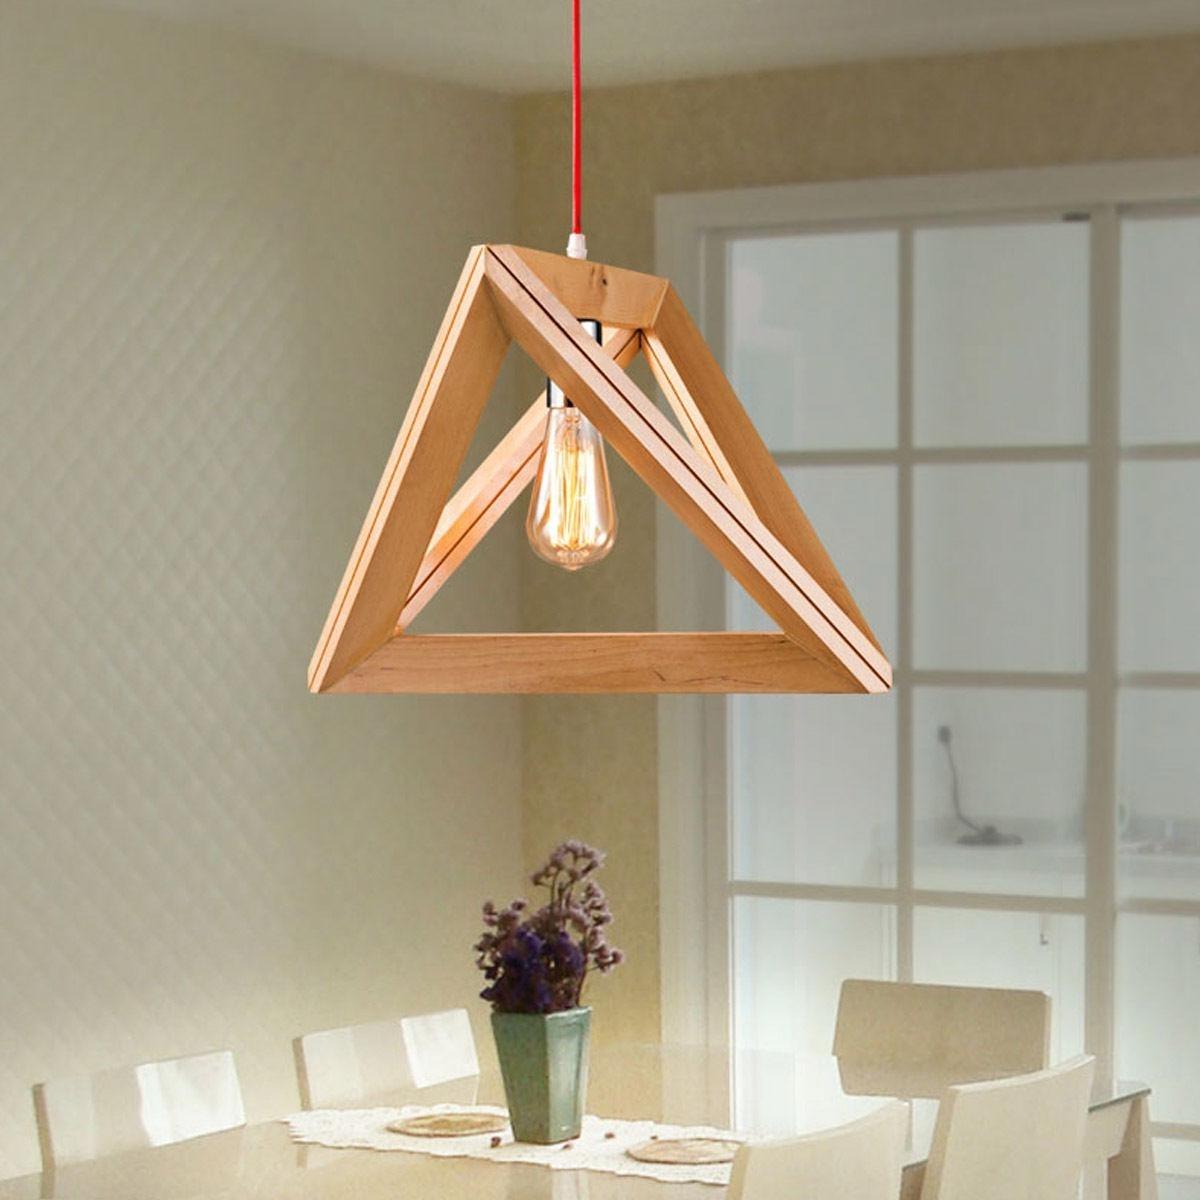 Most Recently Released Wooden Chandeliers Regarding New Modern Art Wooden Ceiling Light Pendant Lamp Lighting Light Wood (View 5 of 15)